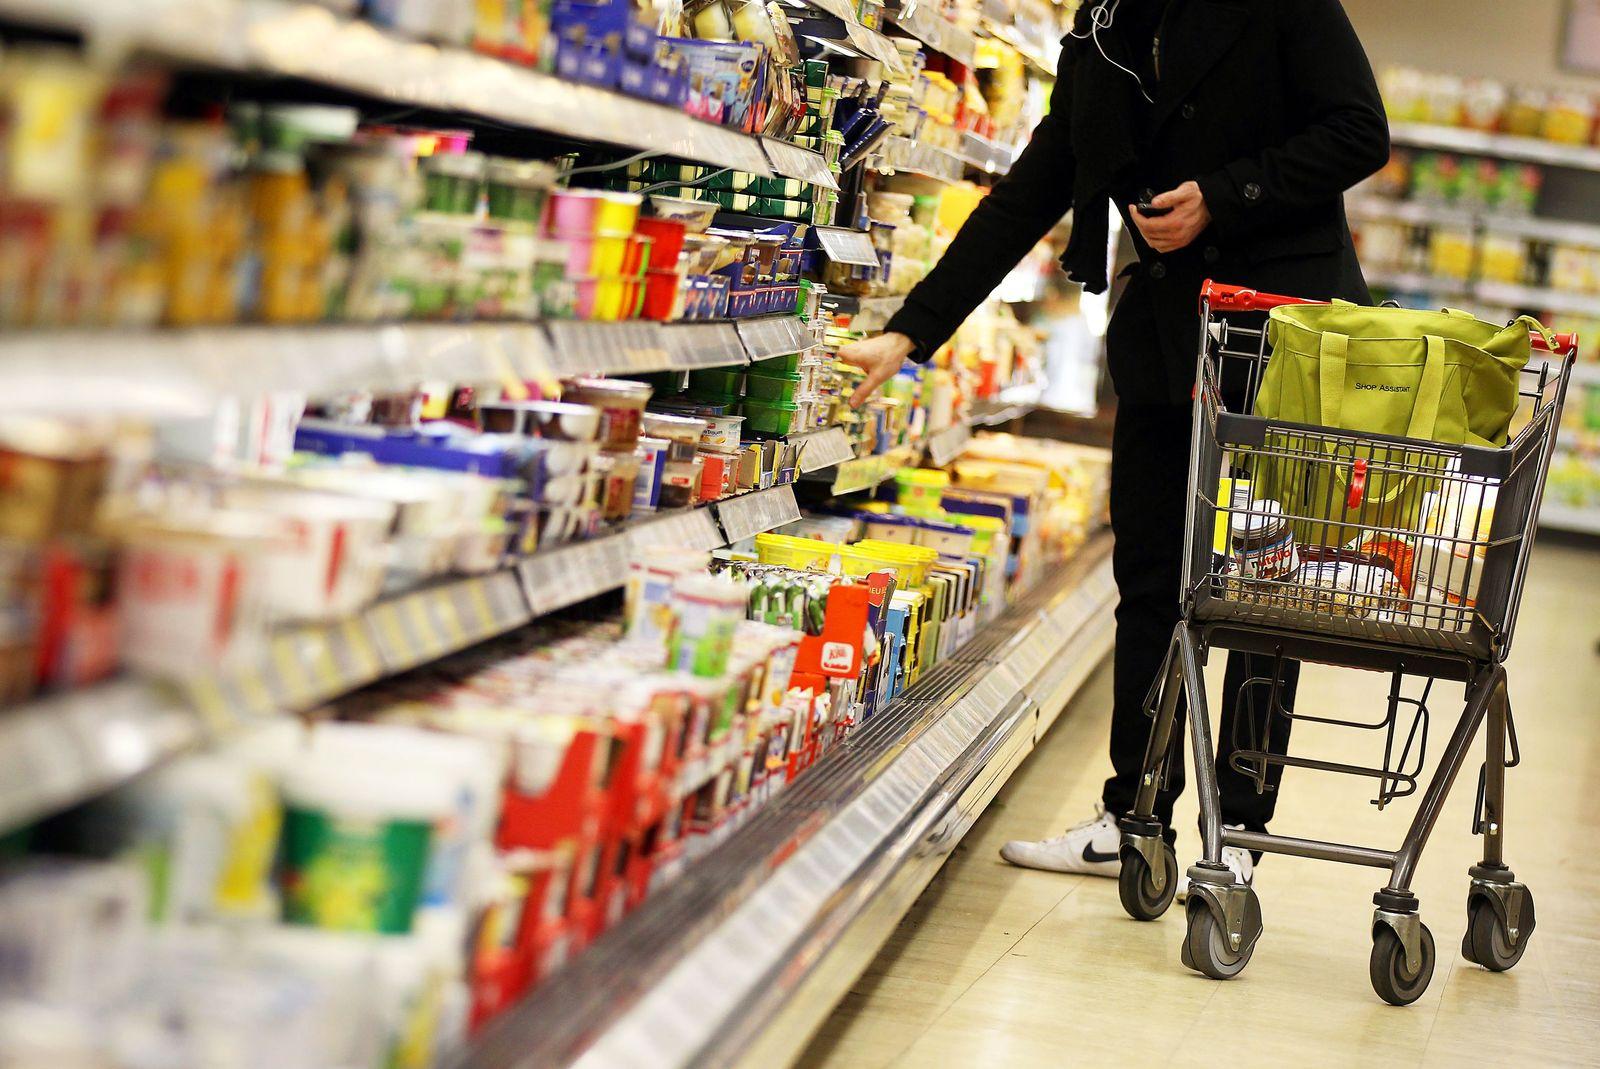 Lebensmittel / Lebensmittel-Regal / Preis / Inflation / Preise